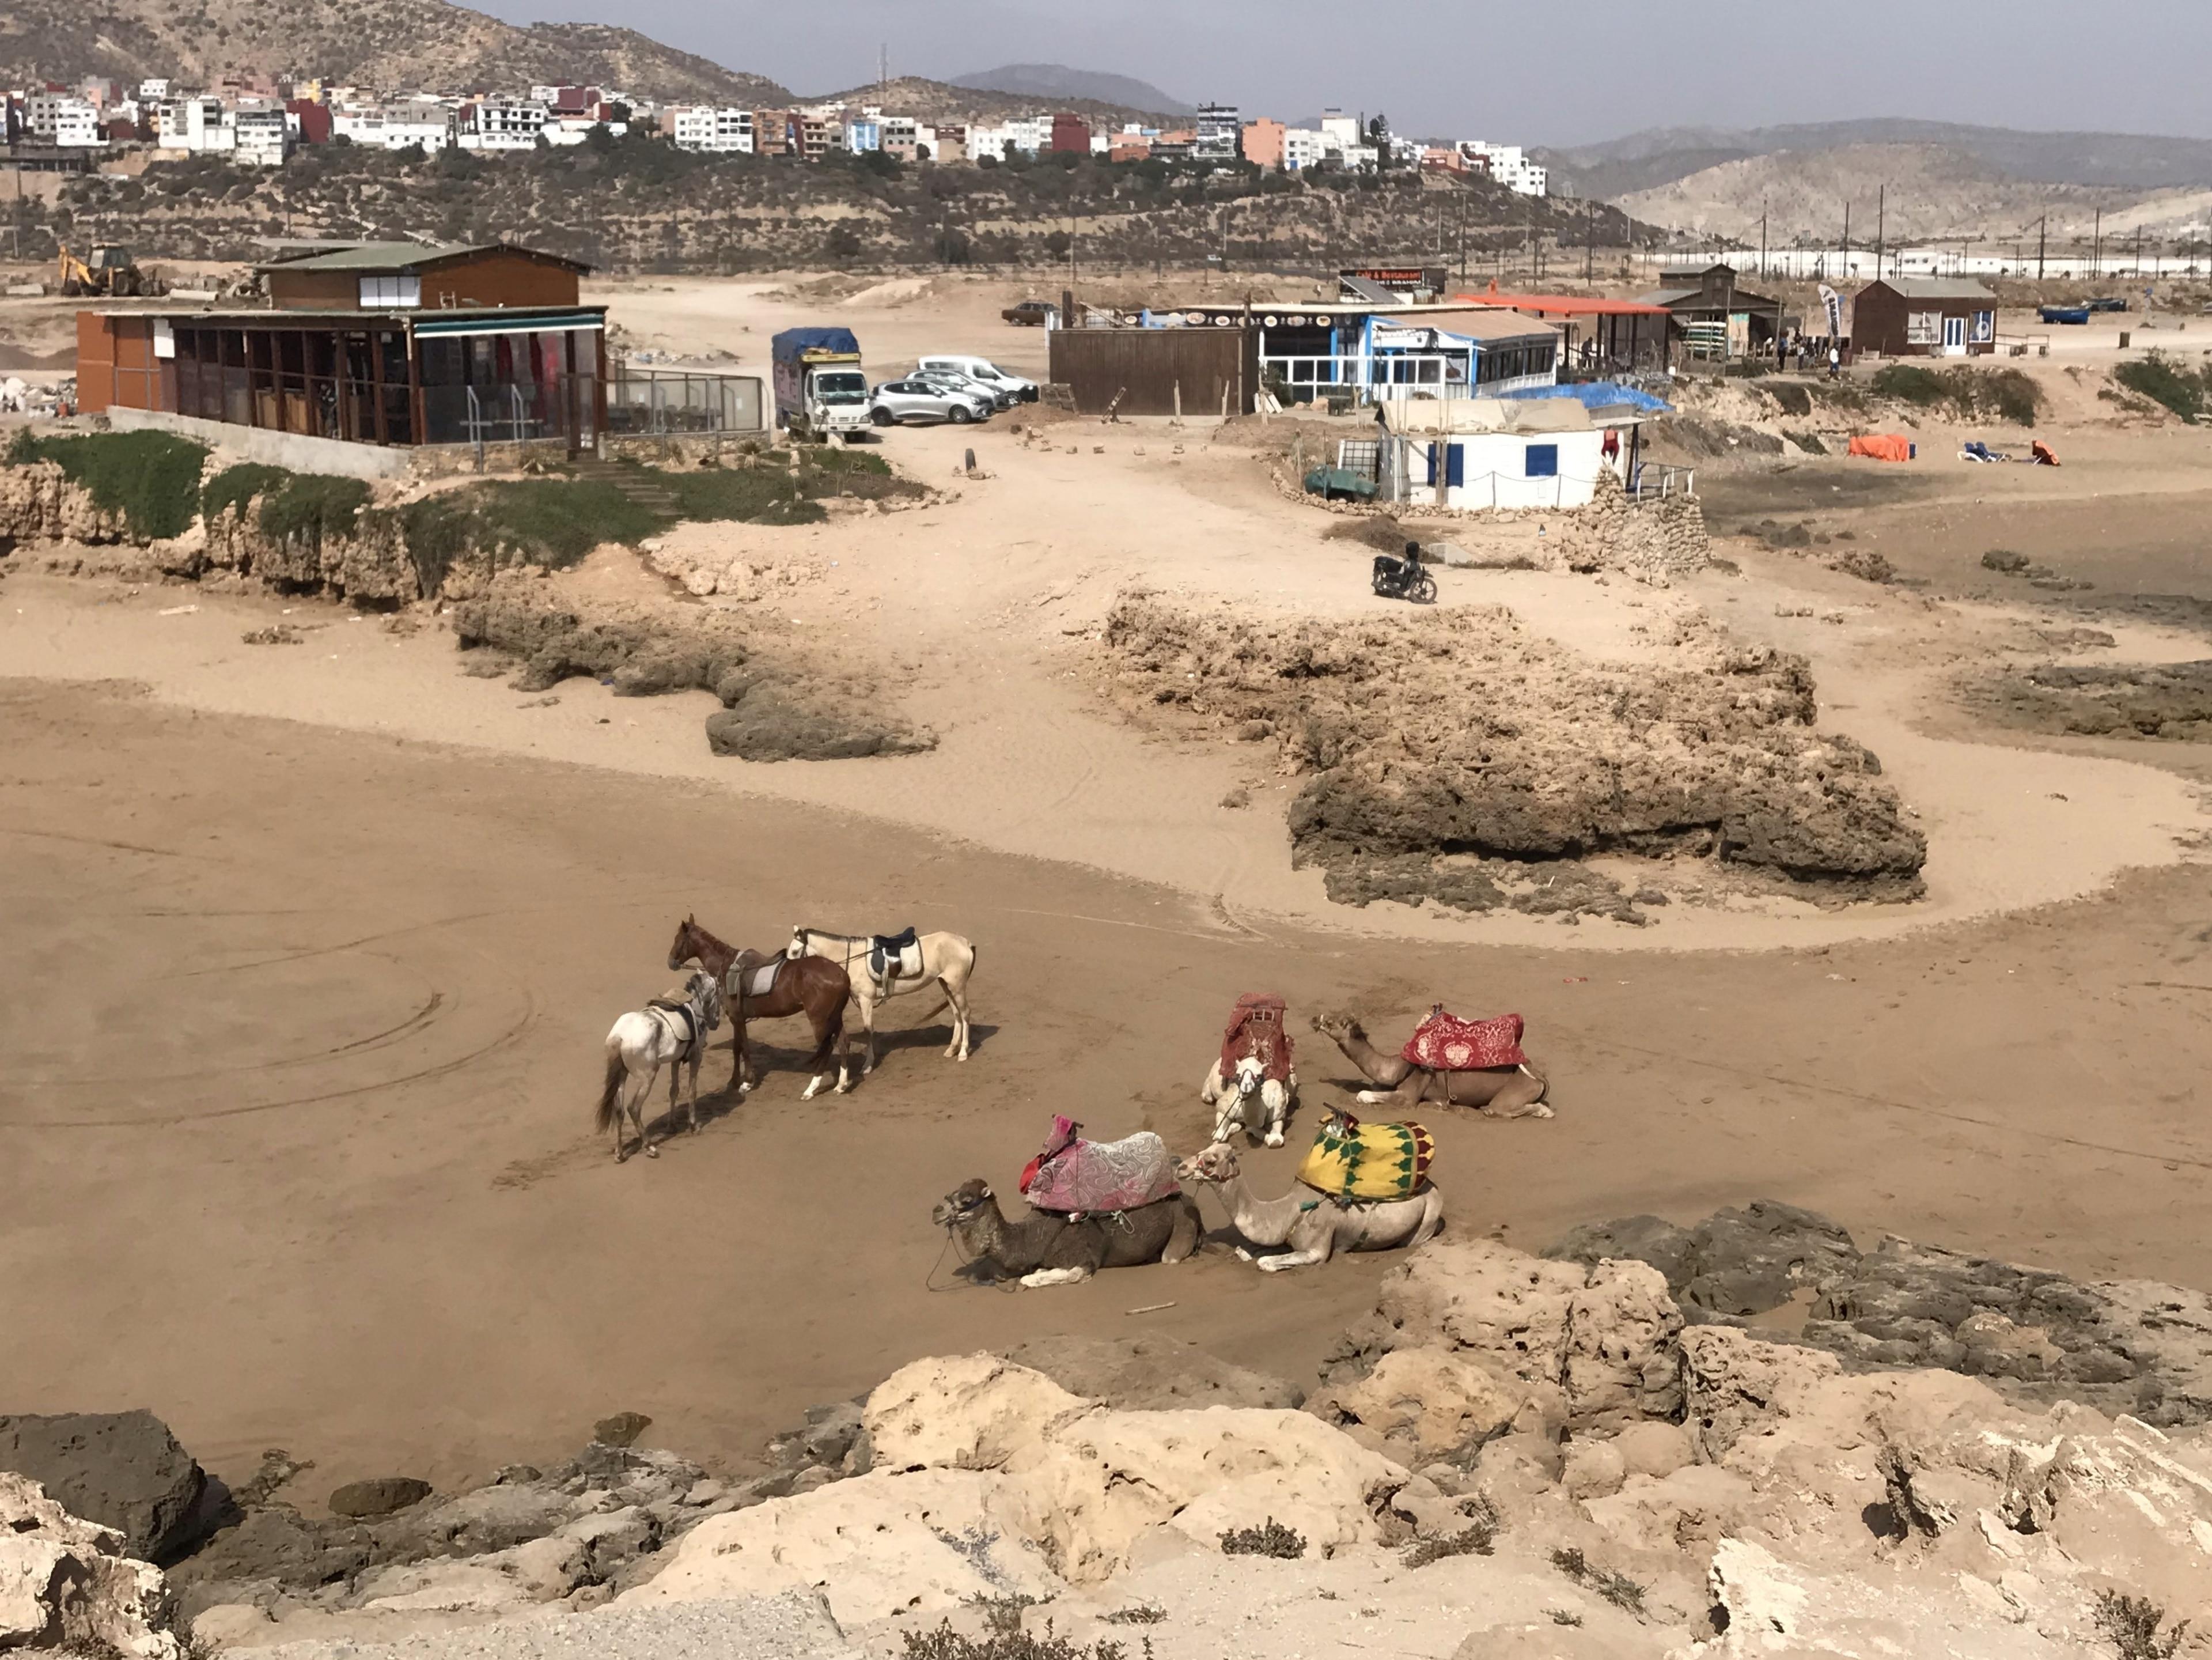 Aourir, Souss-Massa, Morocco